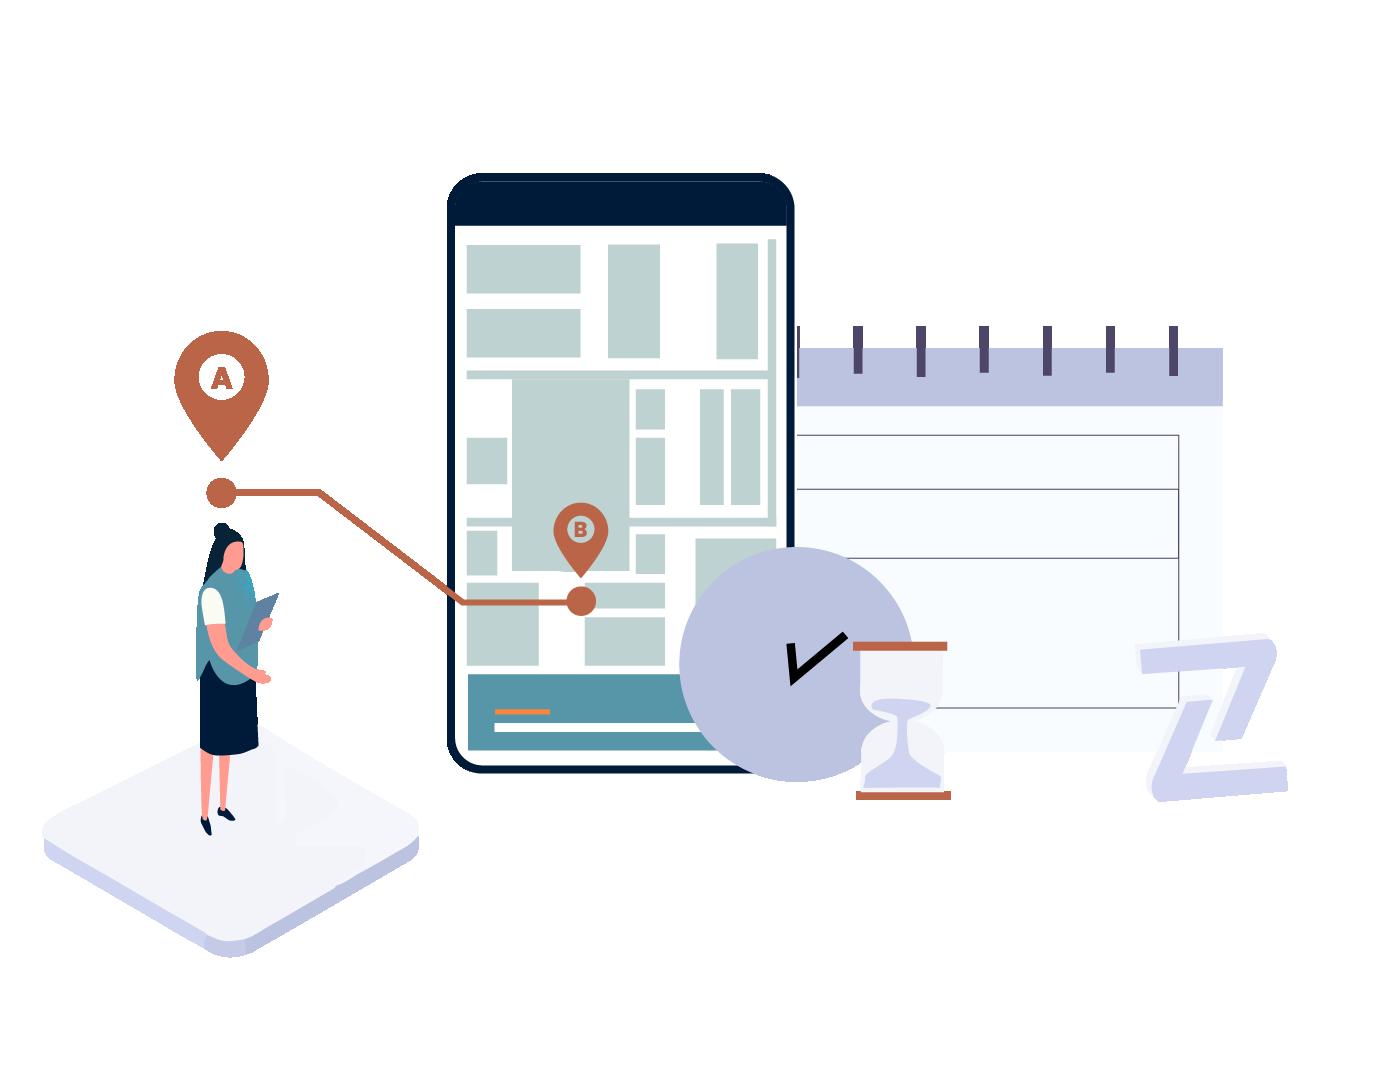 Certification planning software